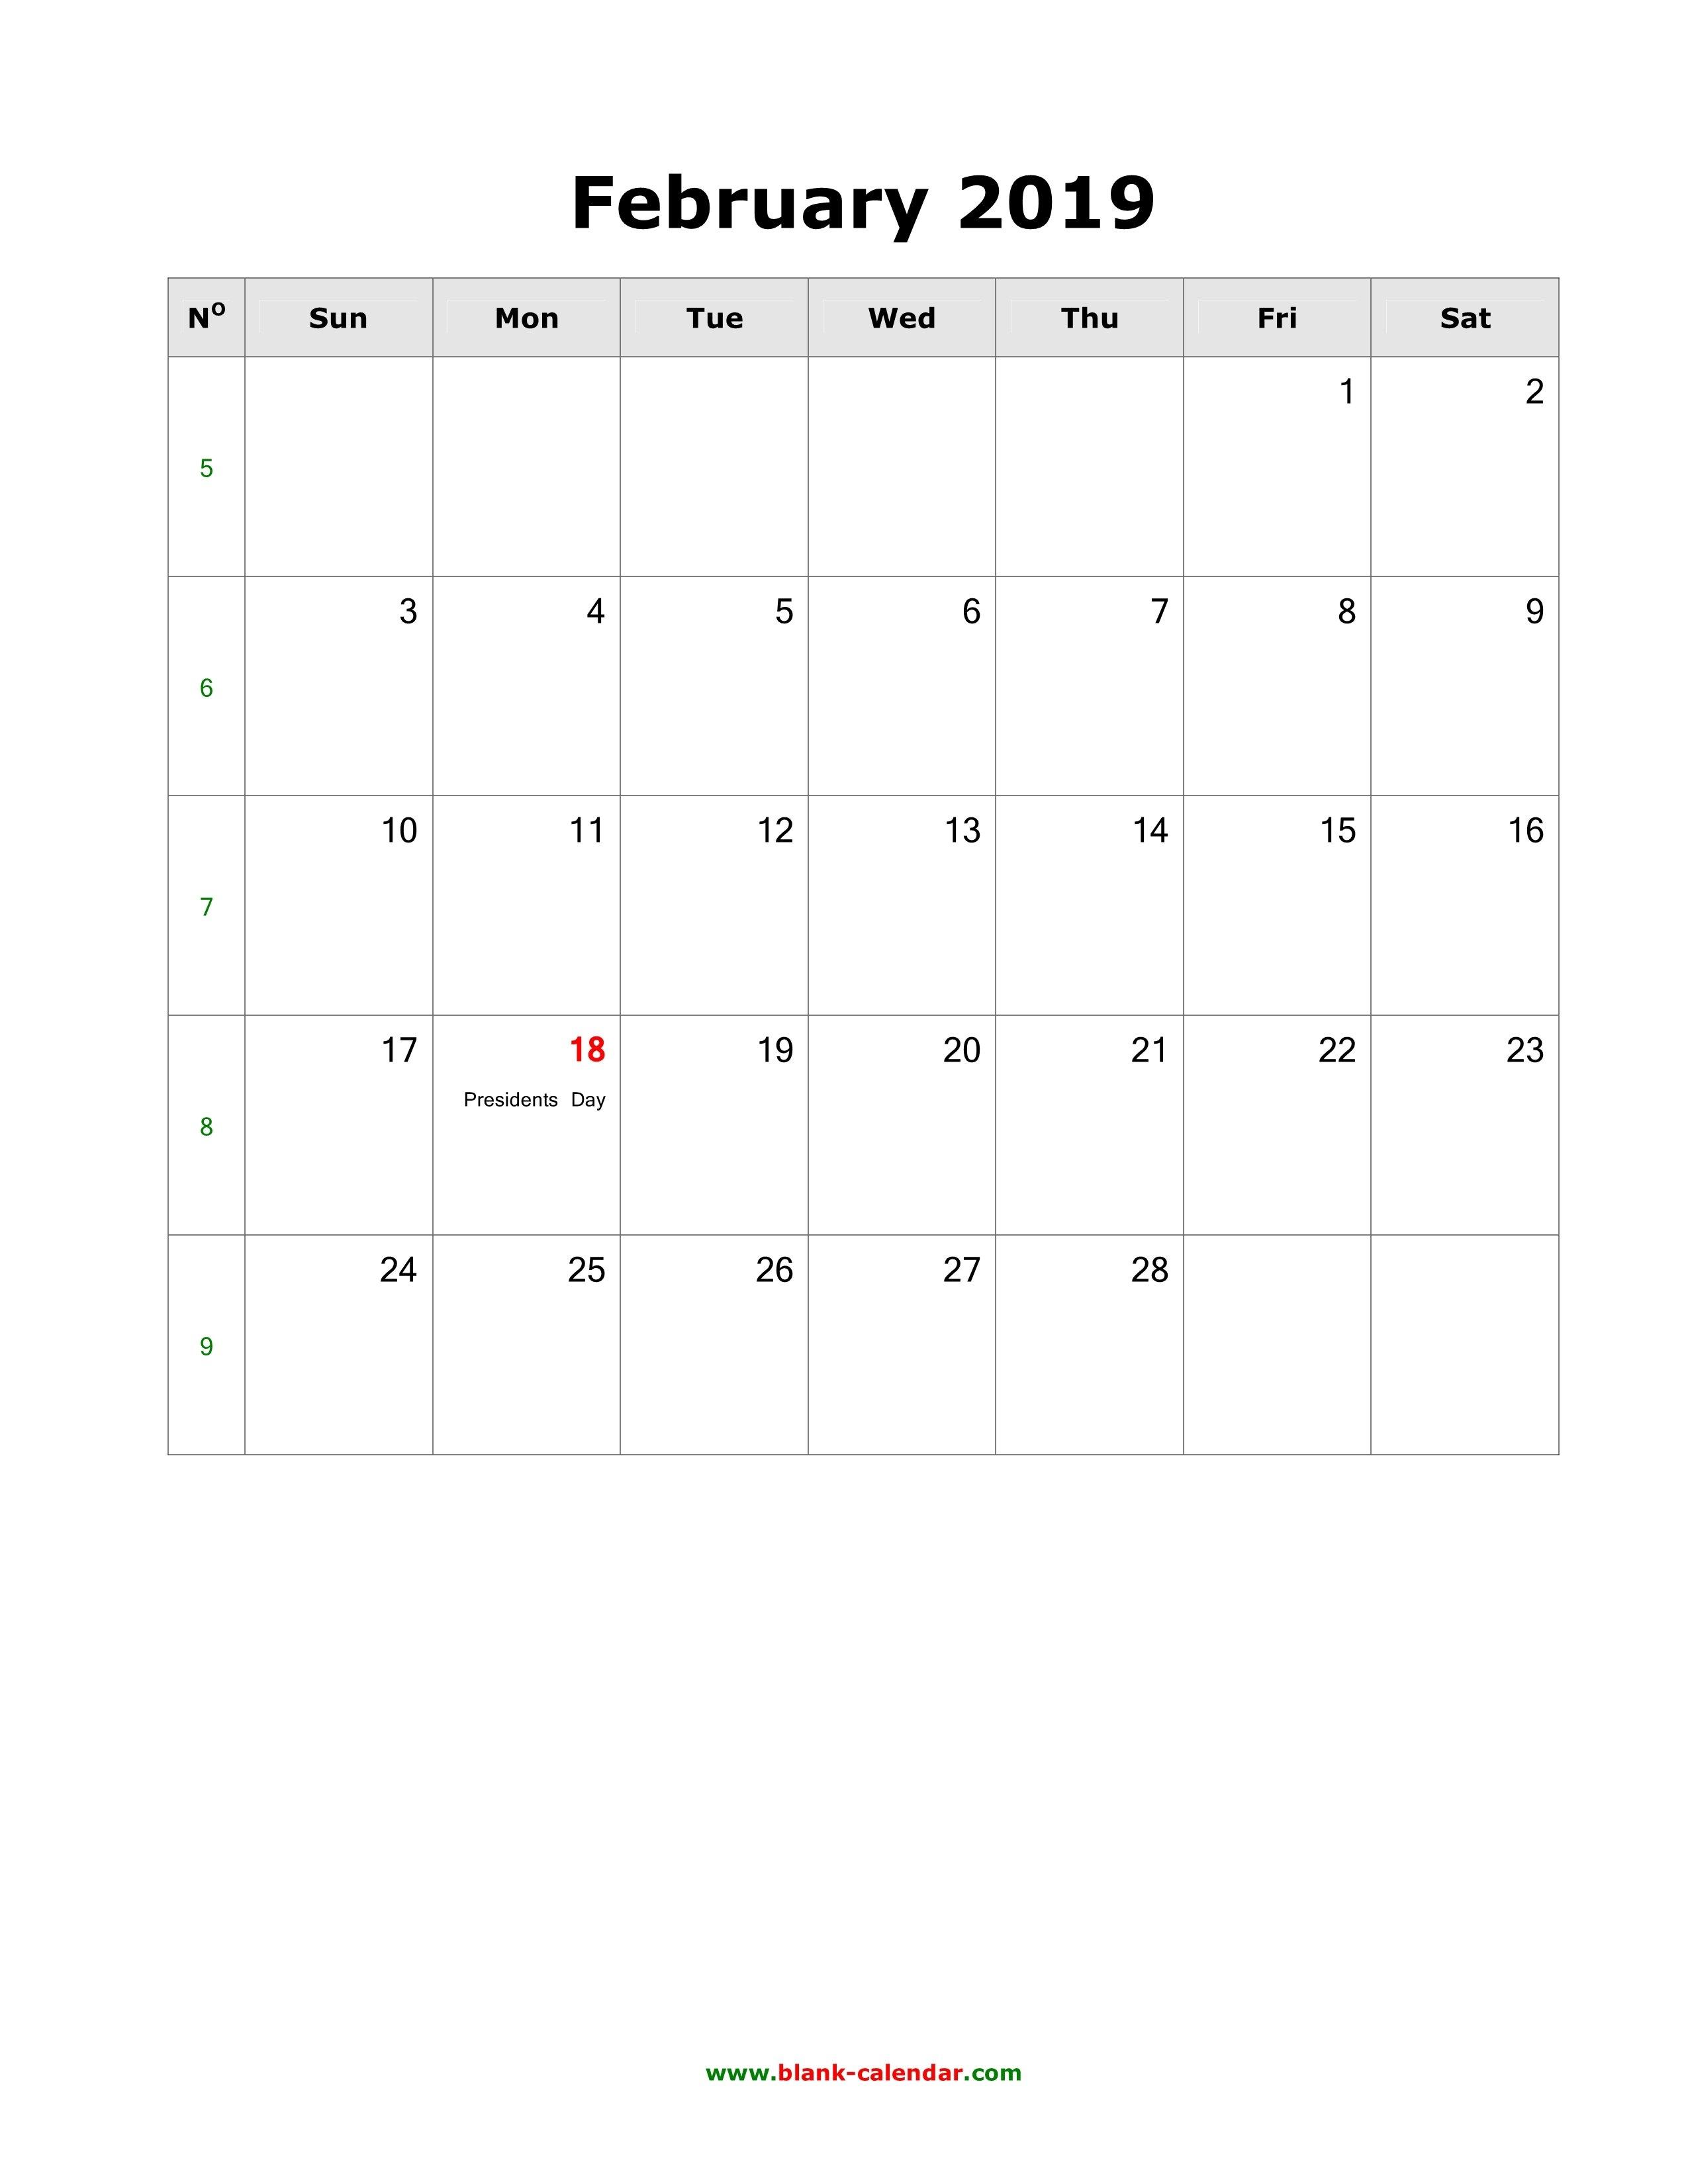 Download February 2019 Blank Calendar With Us Holidays (Vertical) Calendar 2019 Including Holidays